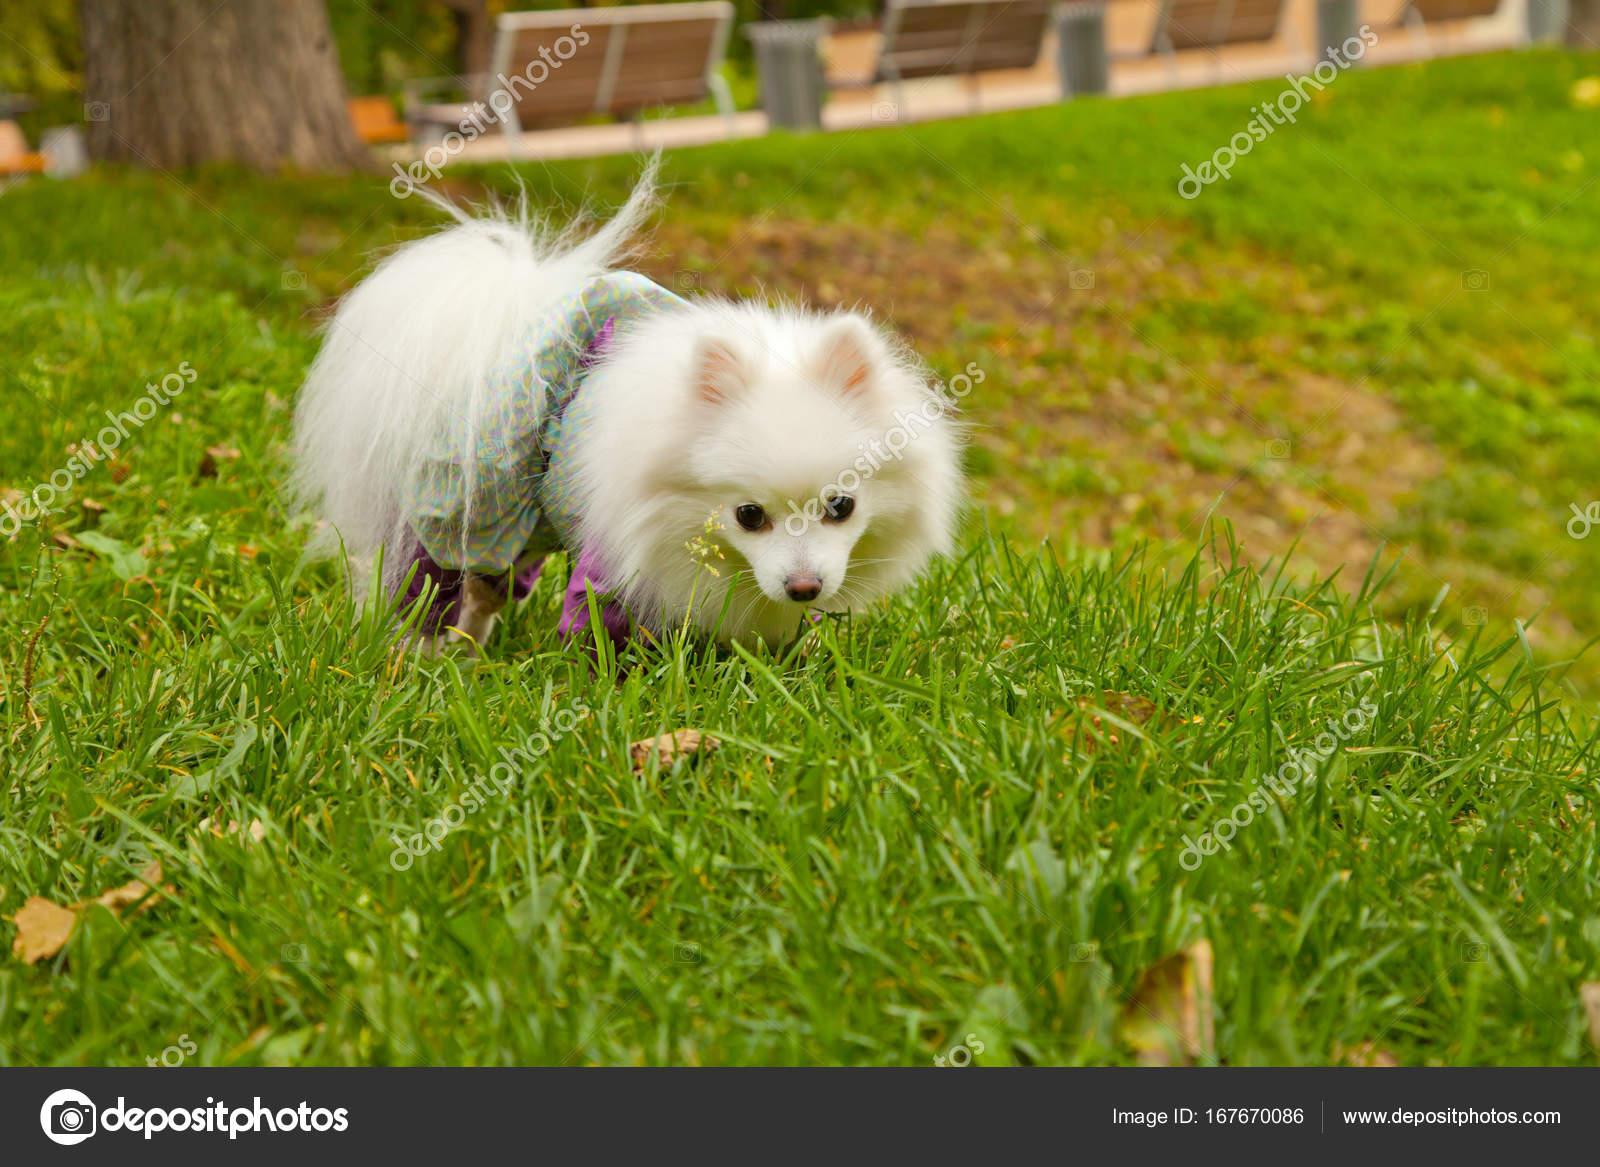 Simple Spitz Canine Adorable Dog - depositphotos_167670086-stock-photo-pretty-cute-pomeranian-spitz-dog  Photograph_136140  .jpg